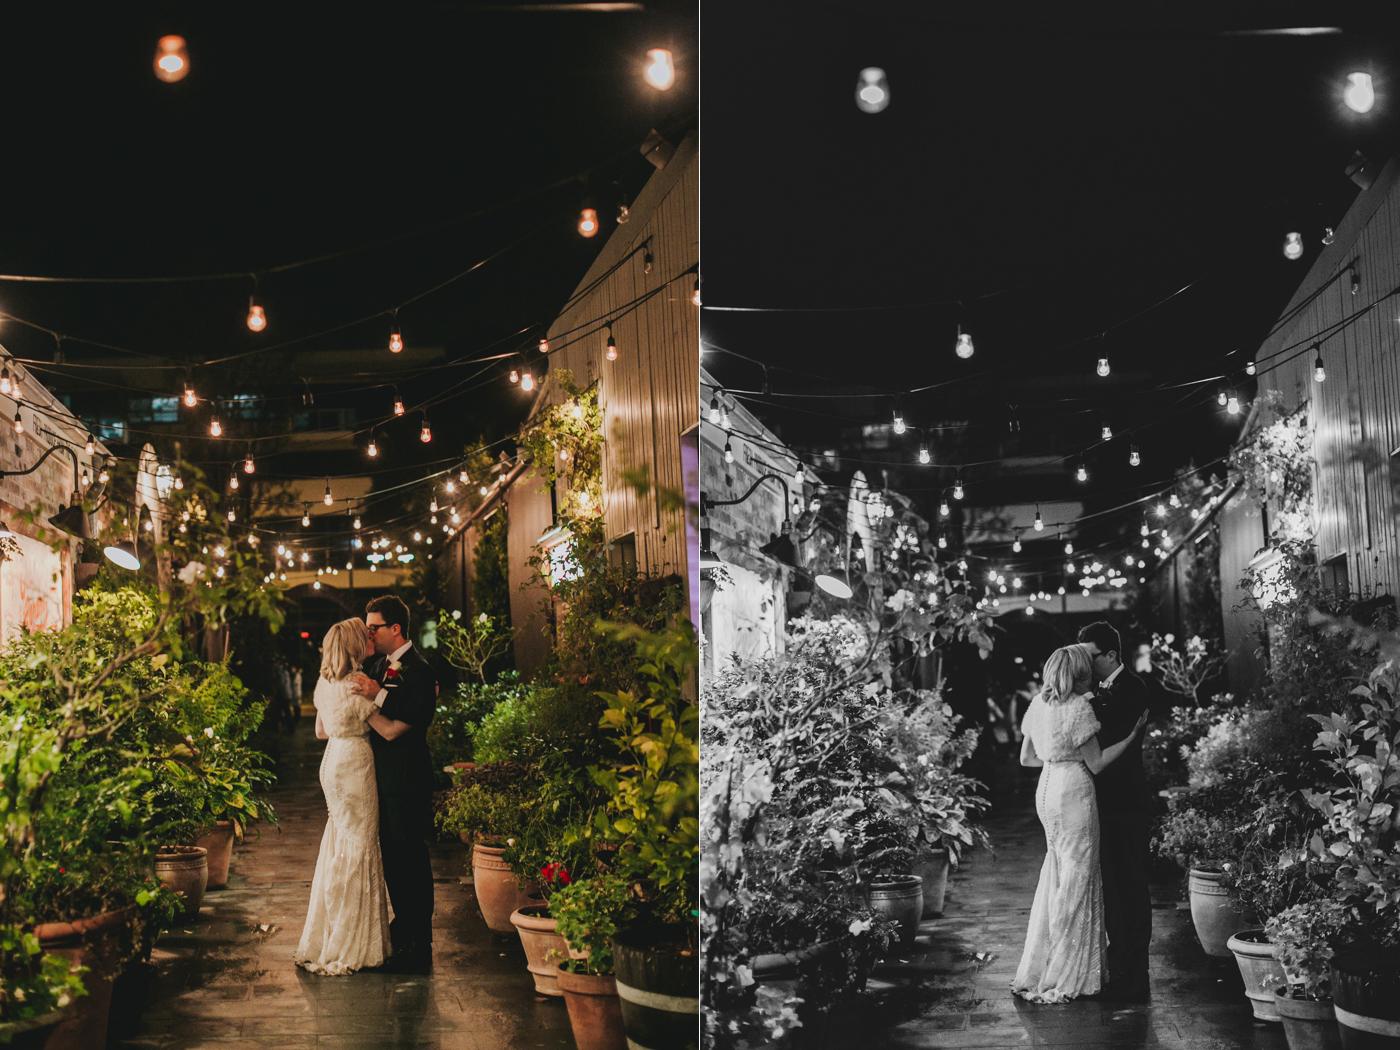 Jo & Tom Wedding - The Grounds of Alexandria - Samantha Heather Photography-328.jpg